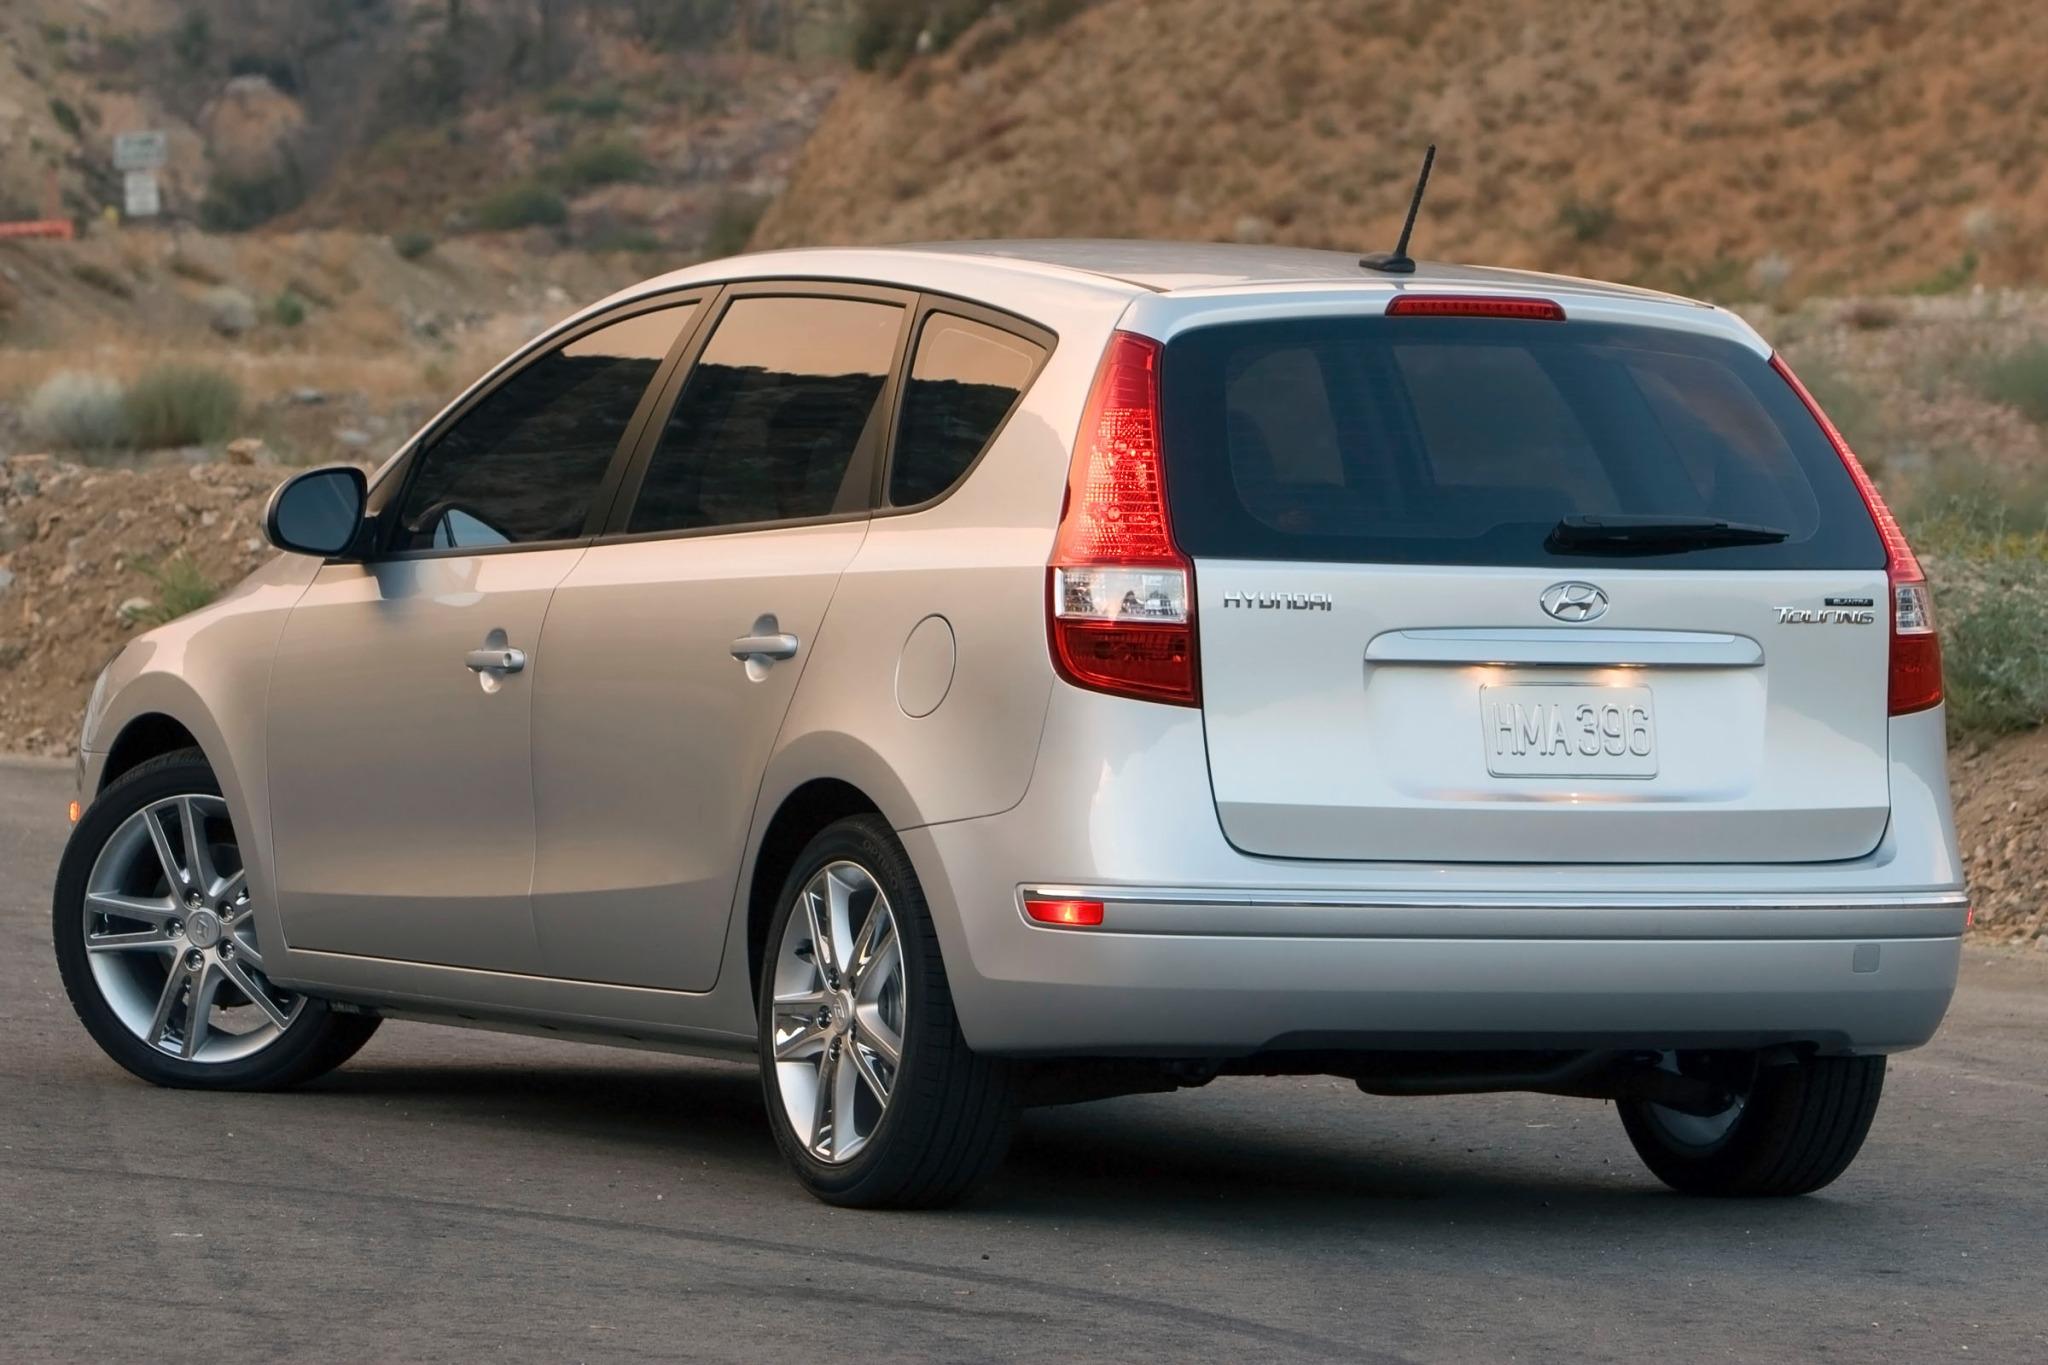 Download 2011 Hyundai Elantra Manual Review Free Software